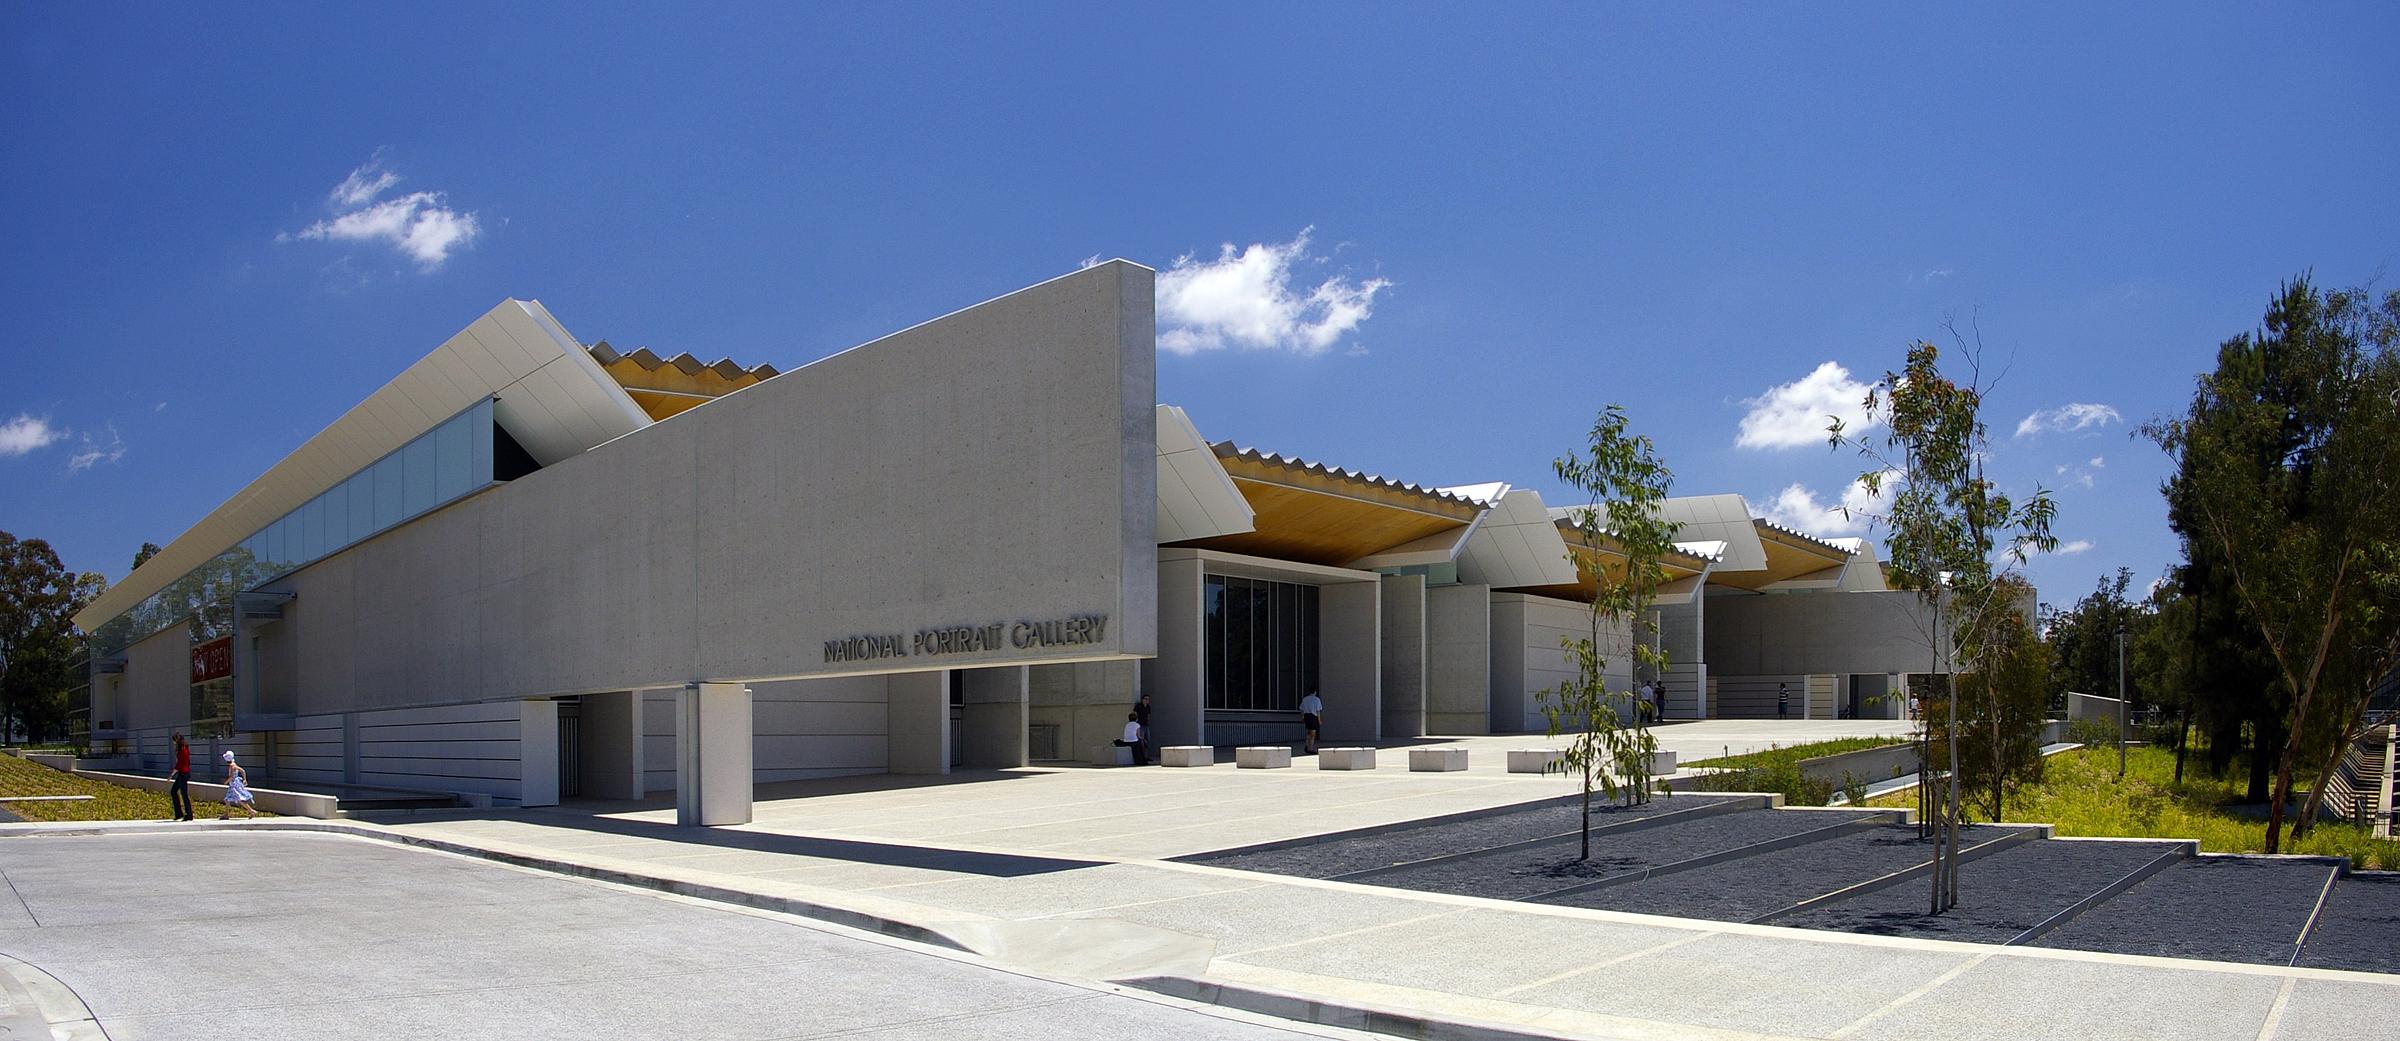 National Portrait Gallery (Australia) - Wikiwand